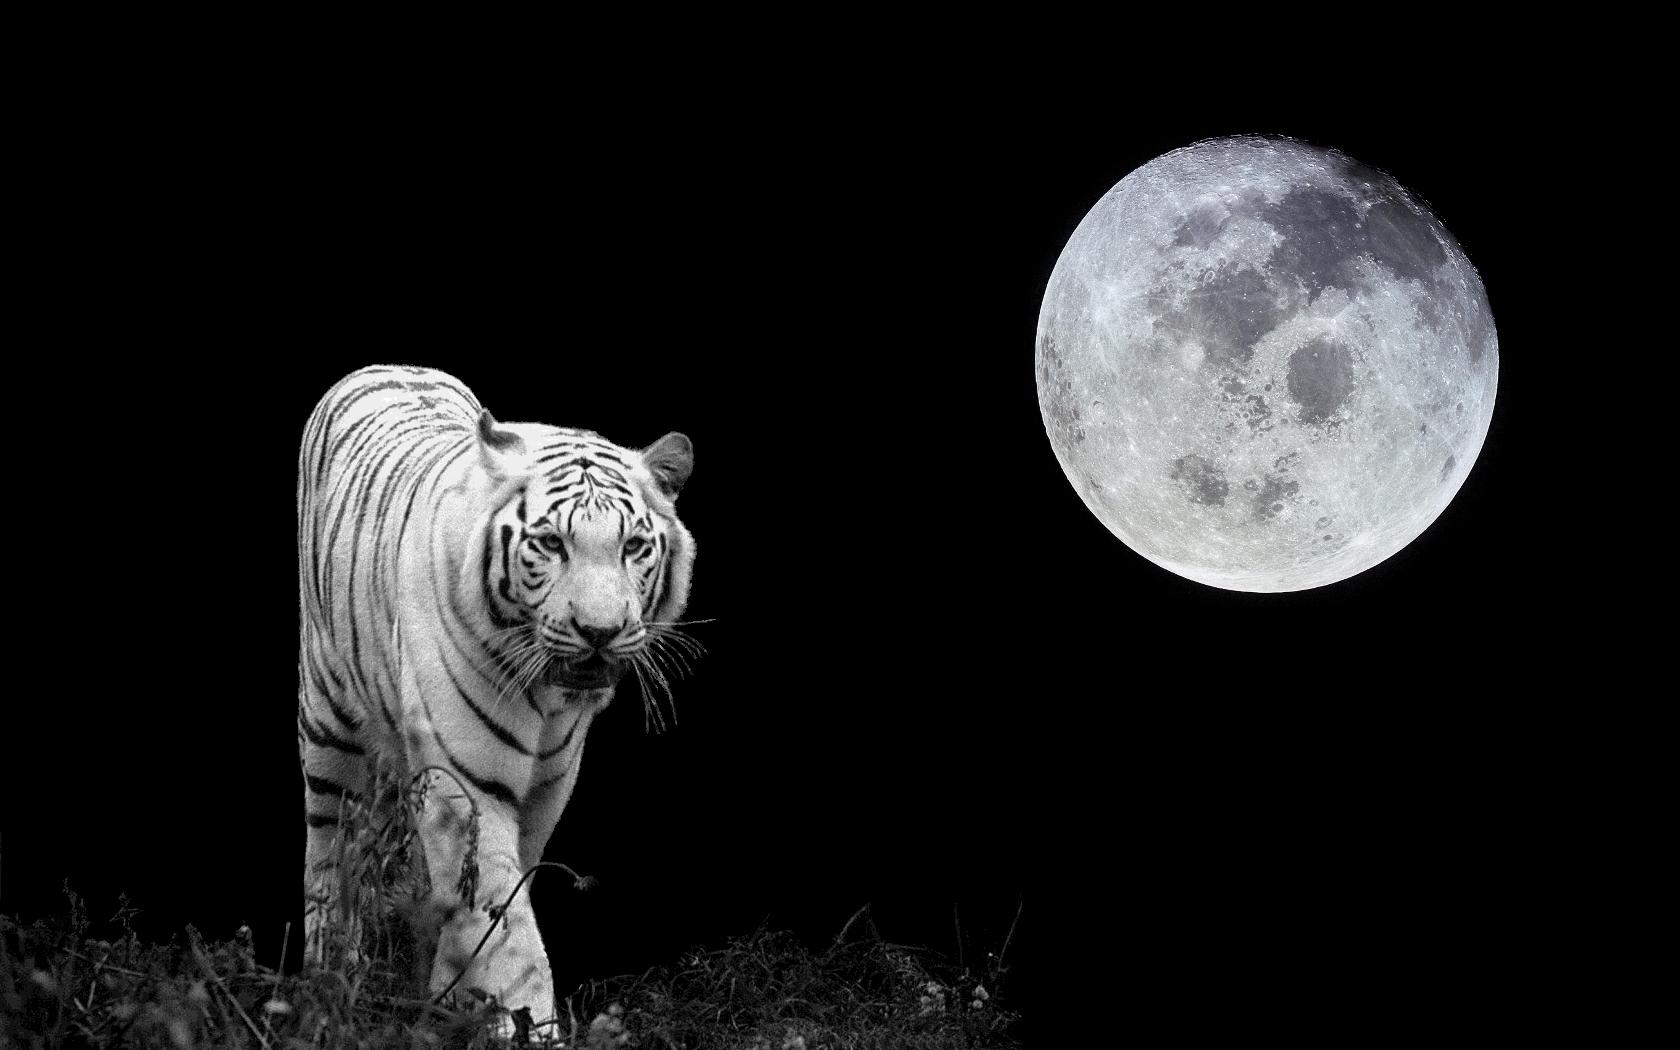 White Tiger Wallpaper Hd Wallpapers Download 1680x1050